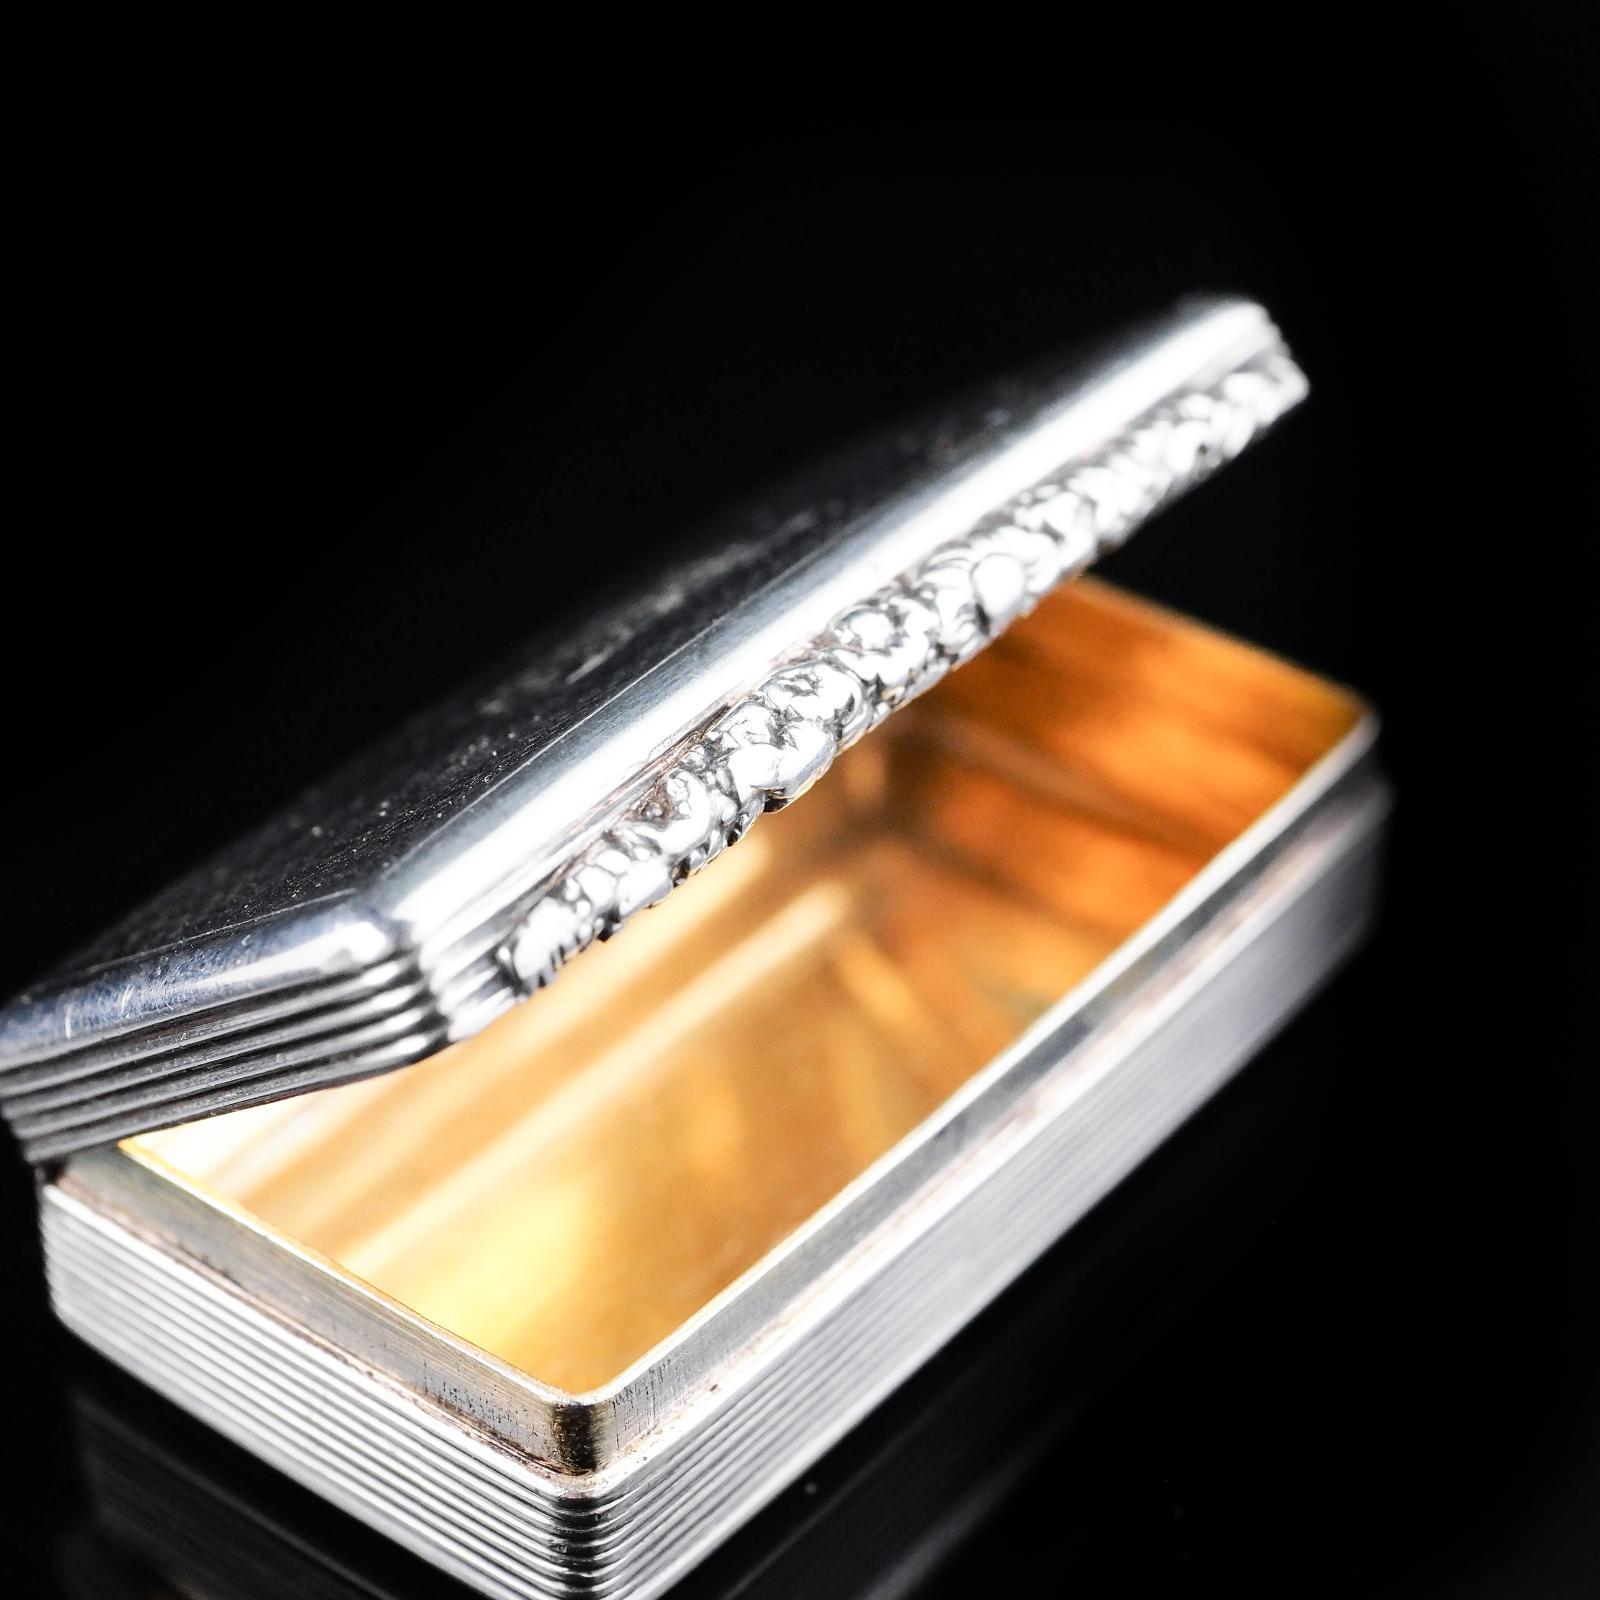 Silver Discreet Antique Original Silver Perfect Enamel Match Box Non-u.s. Silver